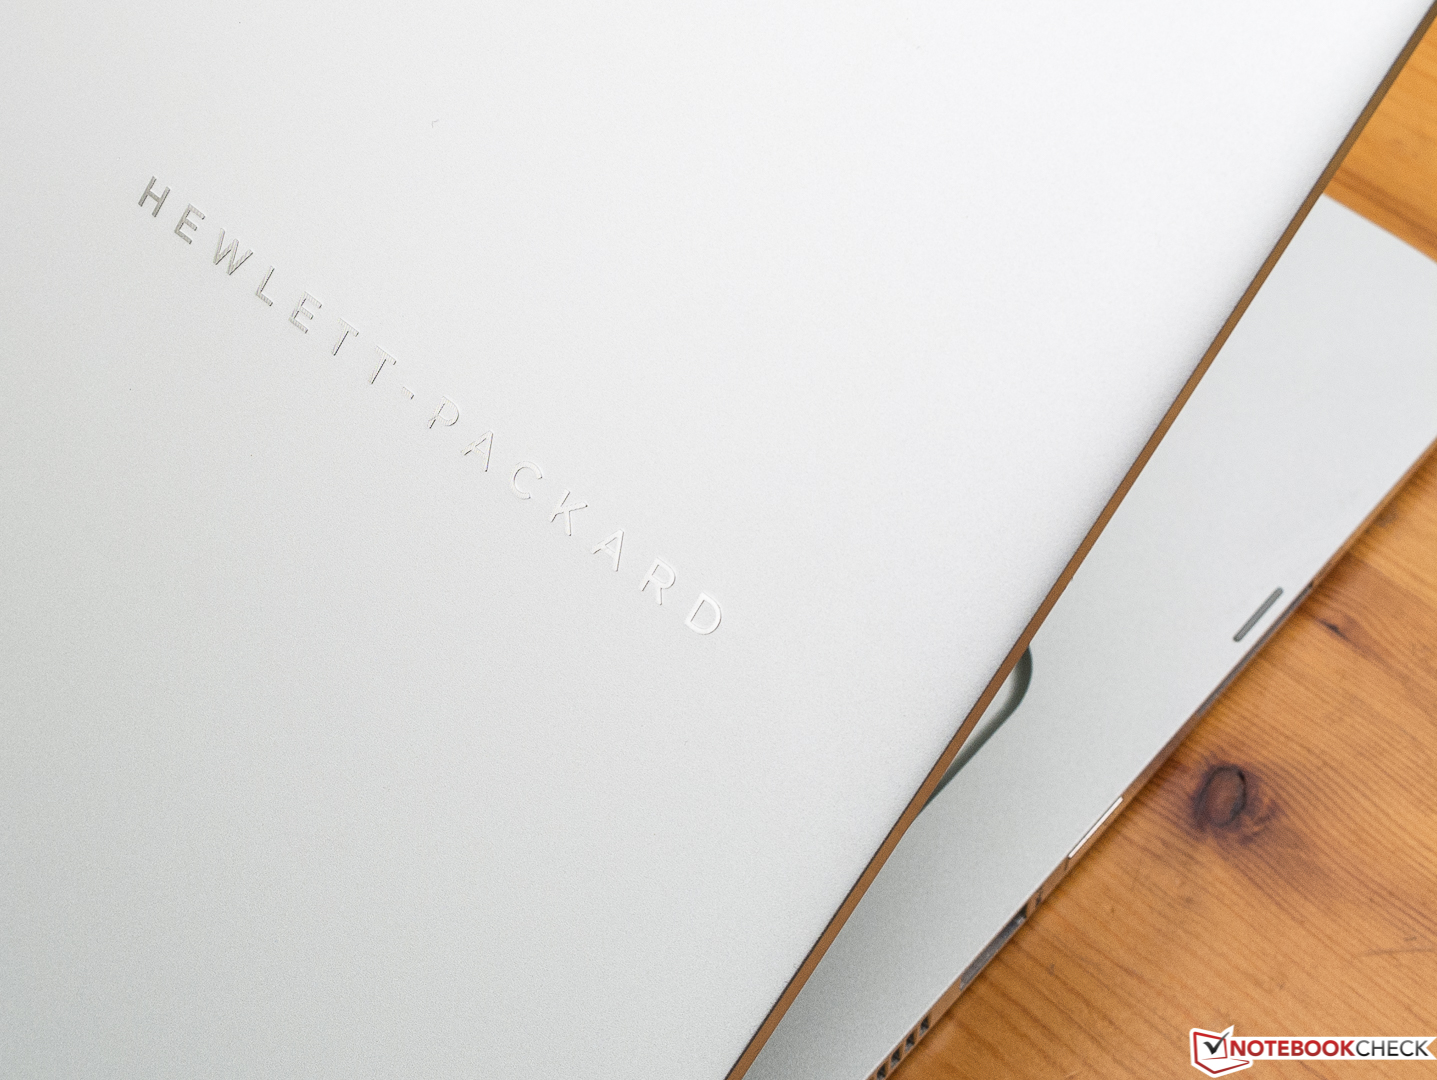 1403 207 kb jpeg wallpaper i would like a wallpaper like the one below 1437x1080